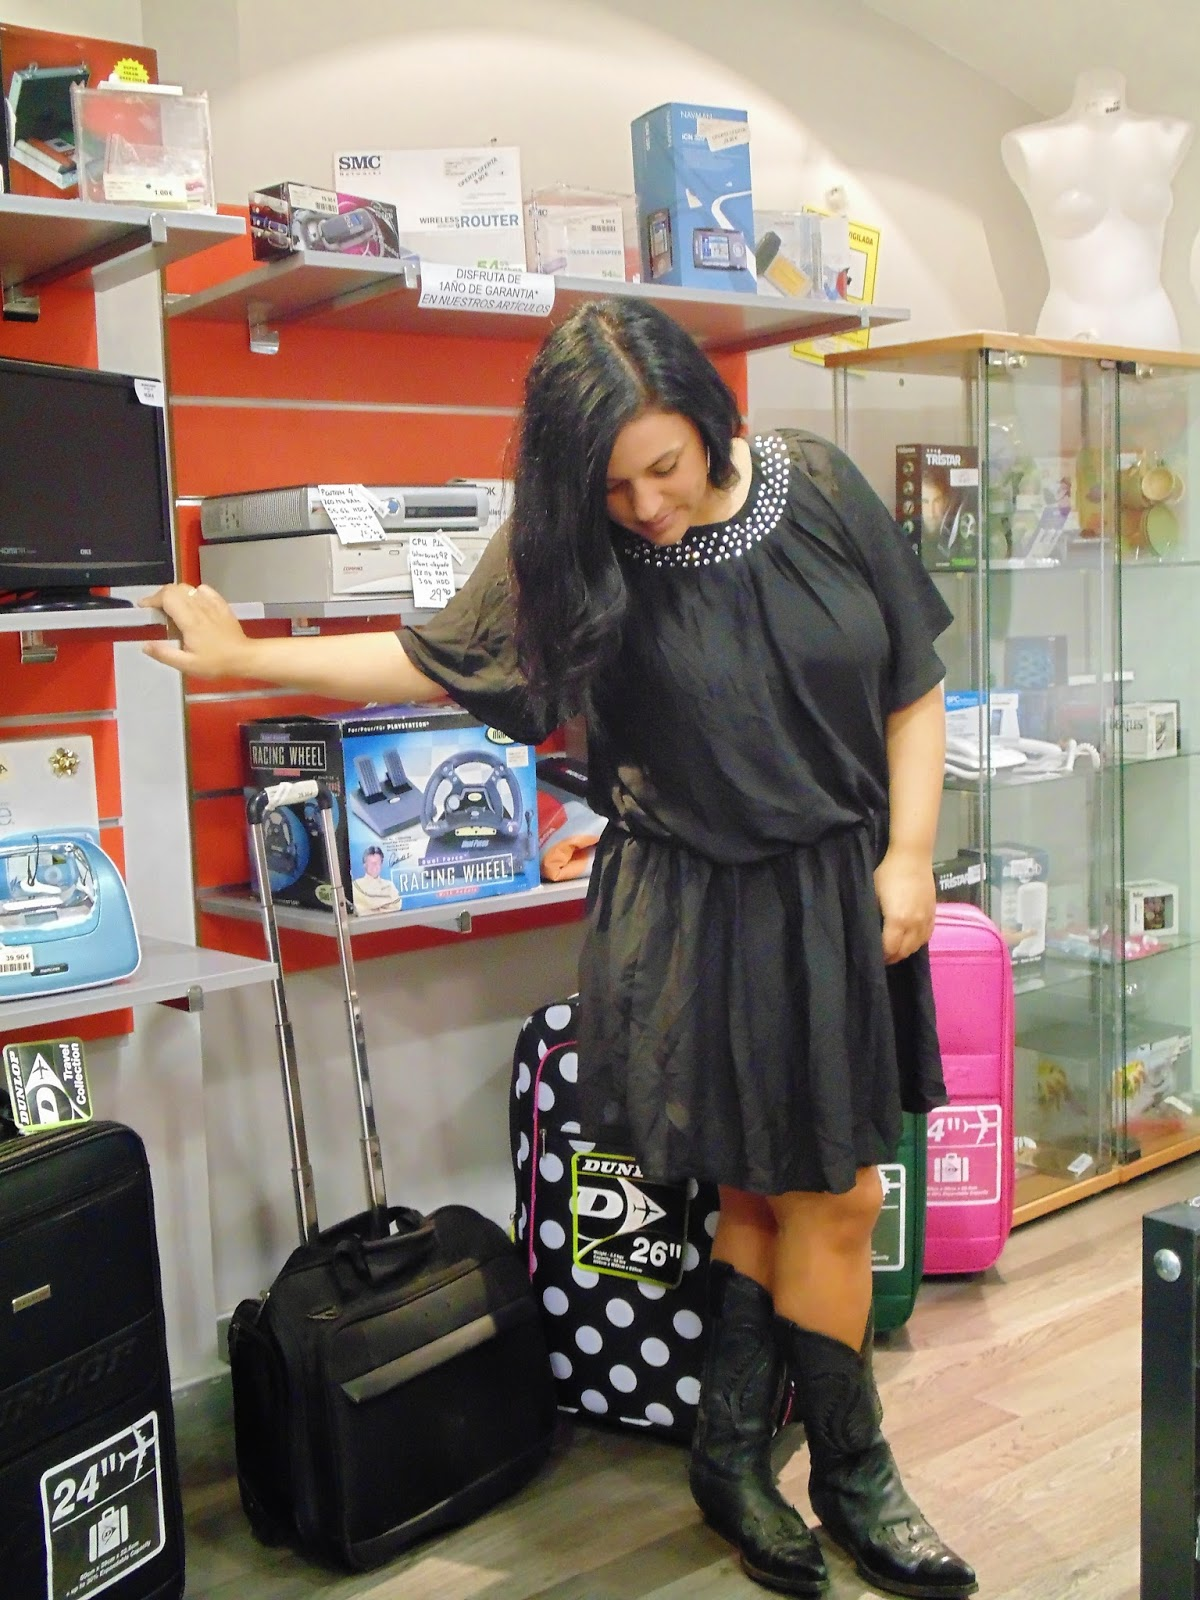 http://www.choies.com/product/black-ruffle-sleeves-dress-with-diamond?cid=3957jesspai